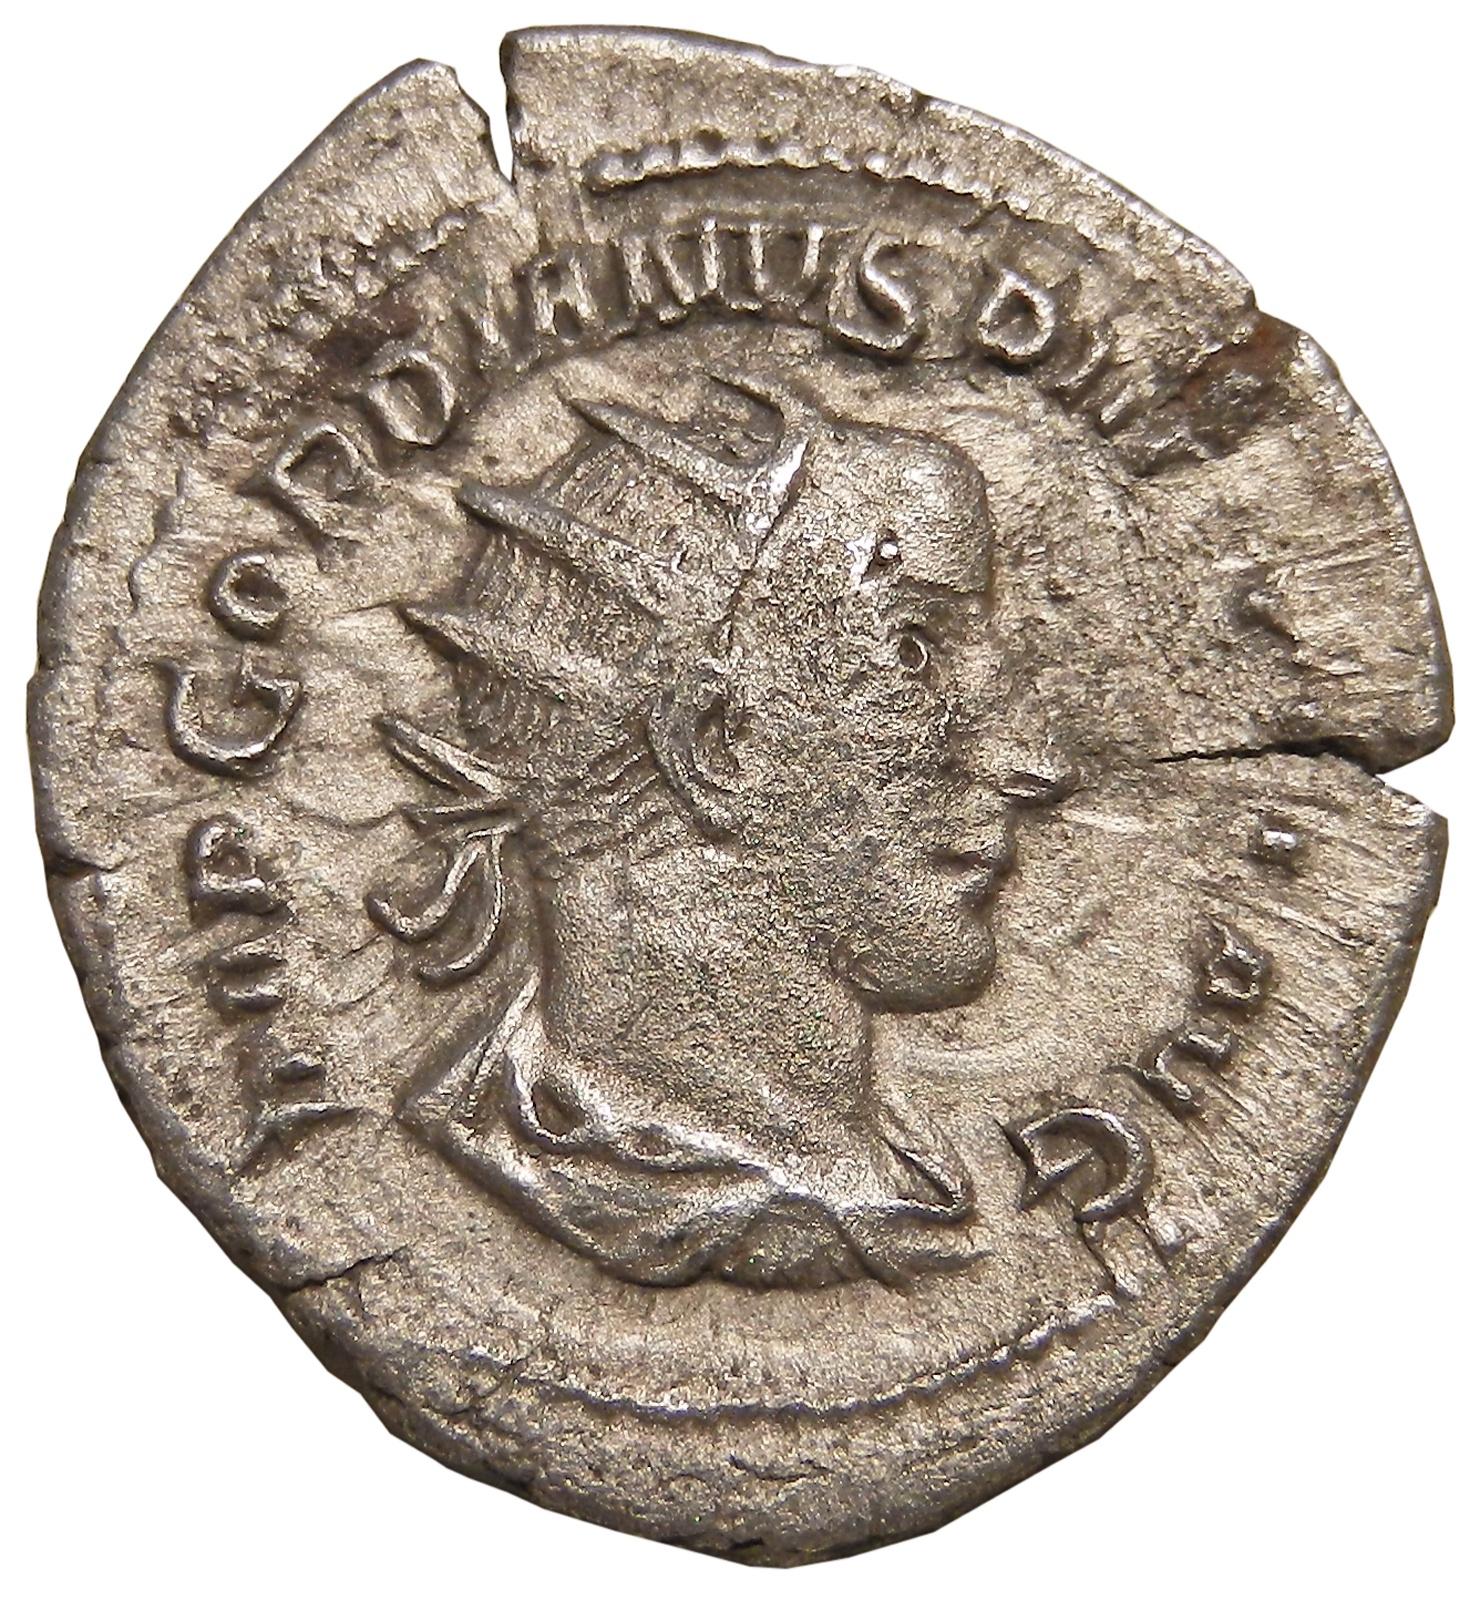 Монета антониниан. Гордиан III. Белый металл. Древний Рим, 244 год (Виктория)